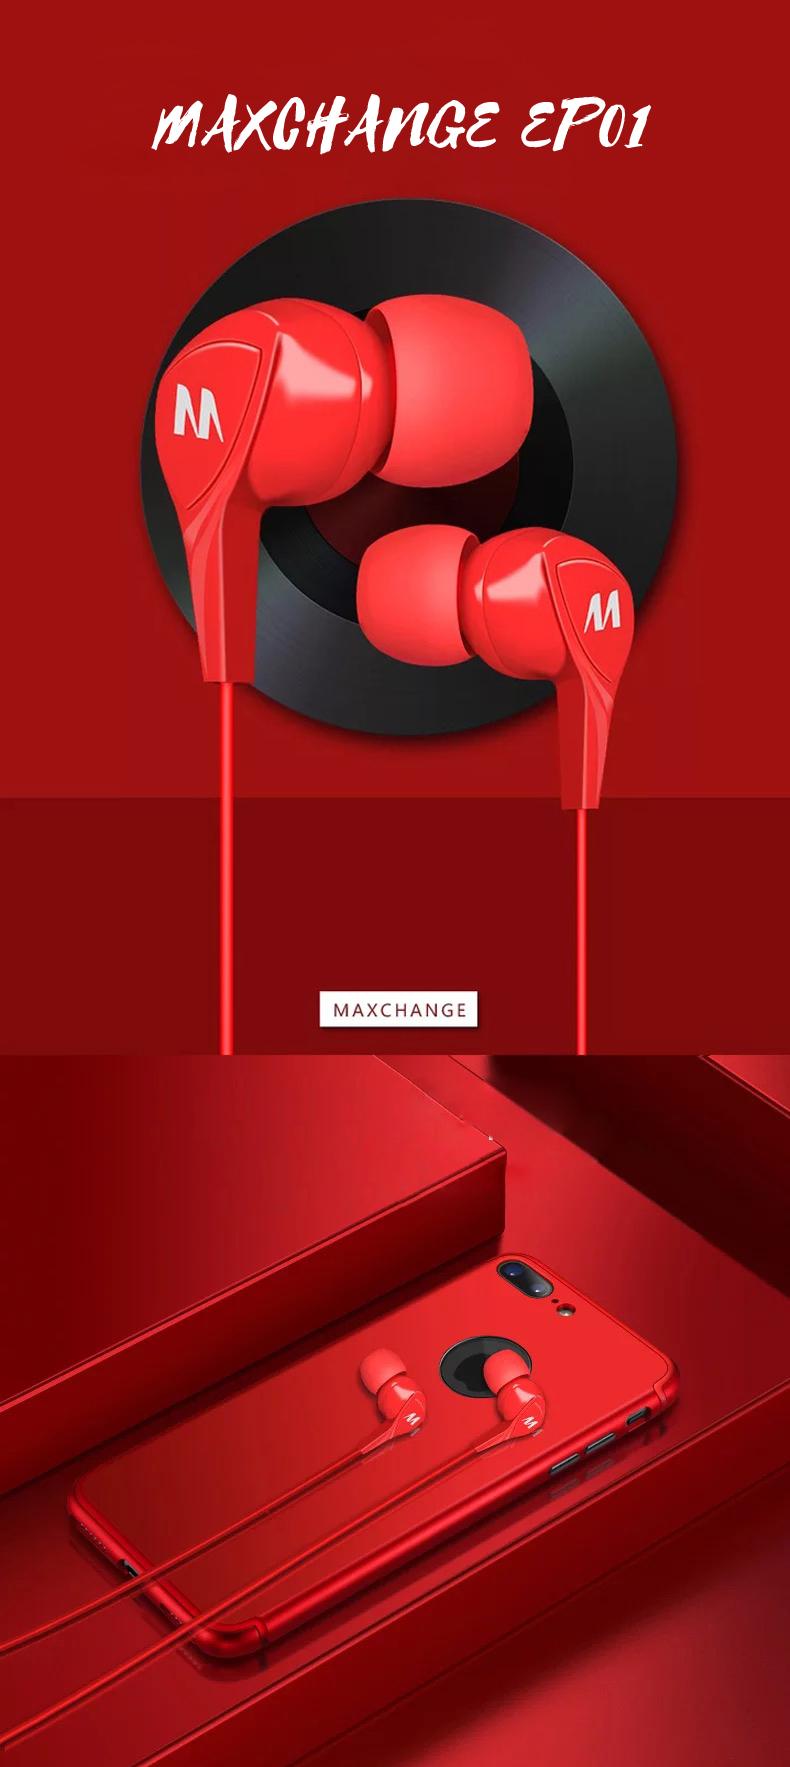 Maxchange EP01 3.5mm Stereo In-Ear Earphone Red White